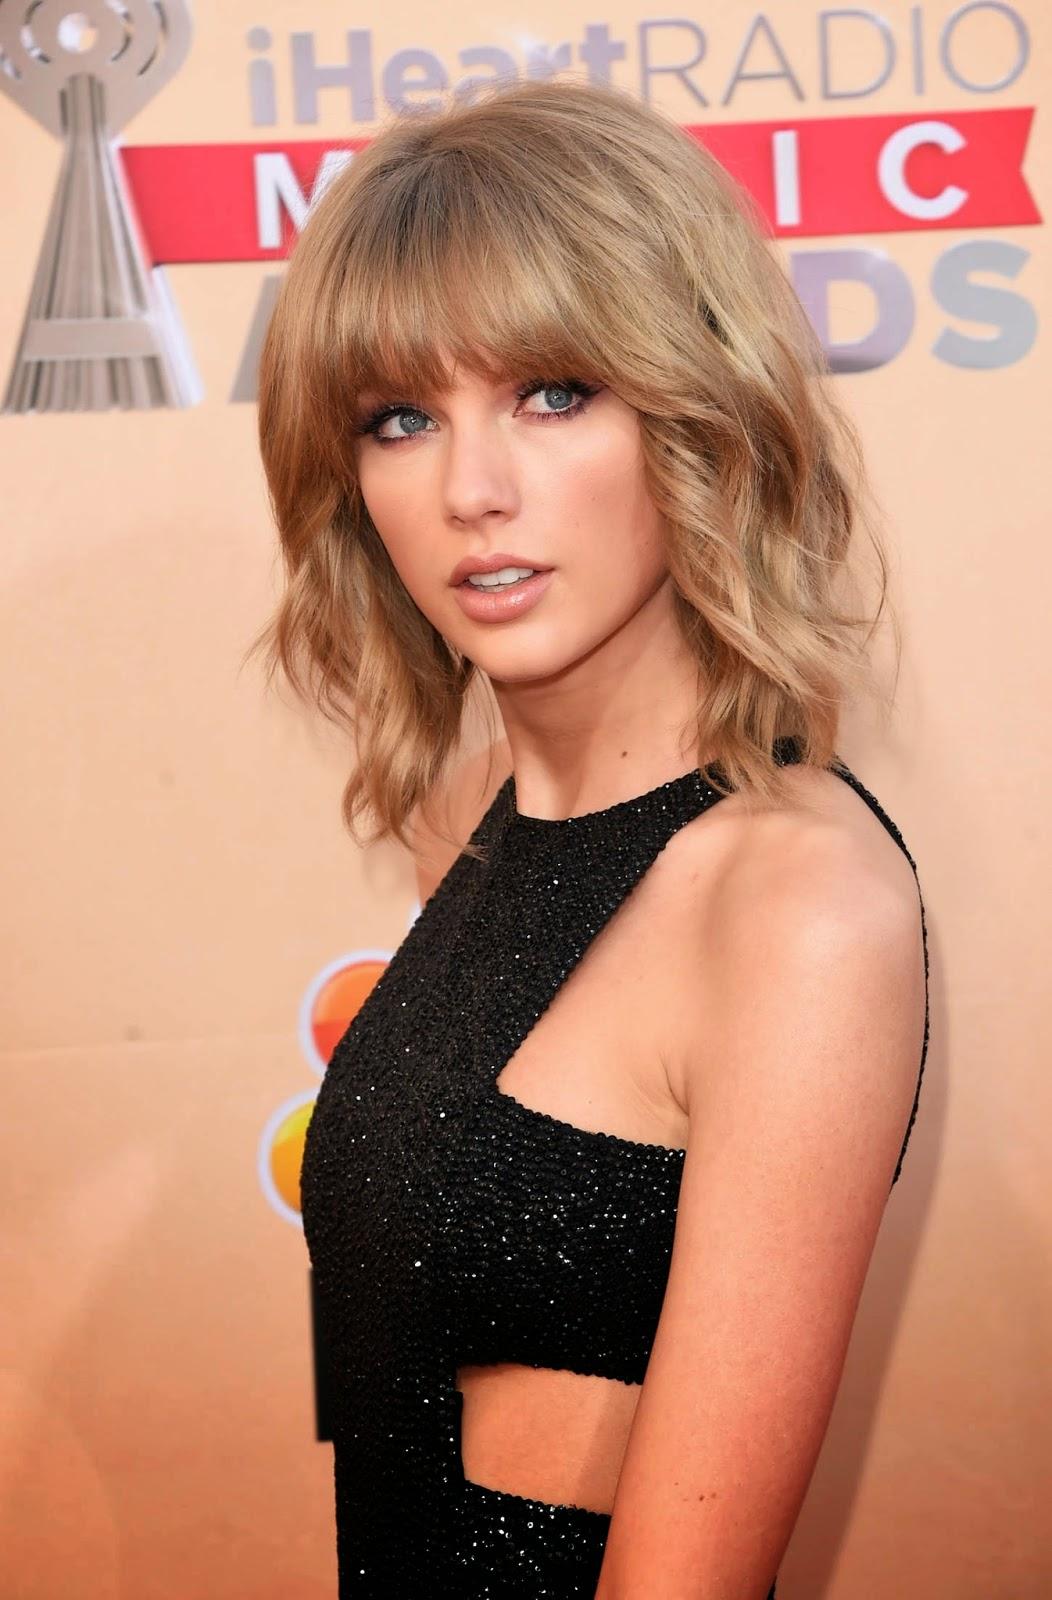 Taylor Swift: 2015 iHeartRadio Music Awards